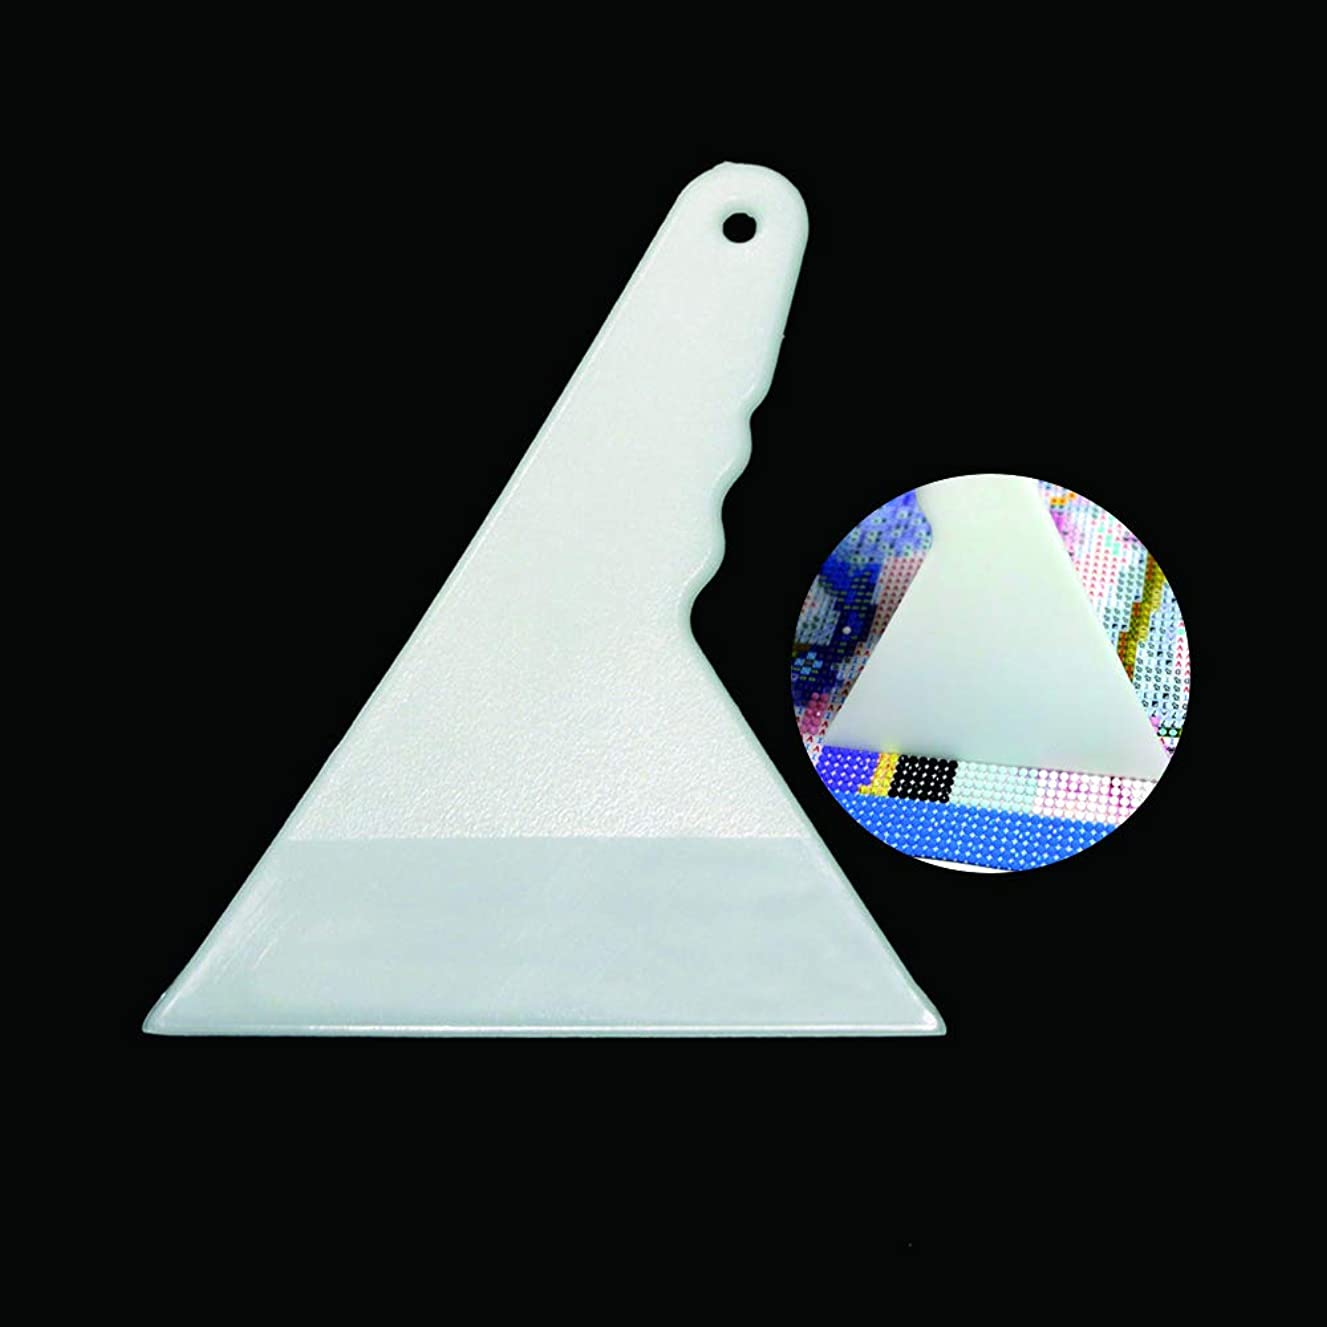 Diamond Painting Fix Tools,Aligning Repair Full Round Drill 5D Diamond Painting Accessories Tools for Diamond Painting Kits for Adults(White)